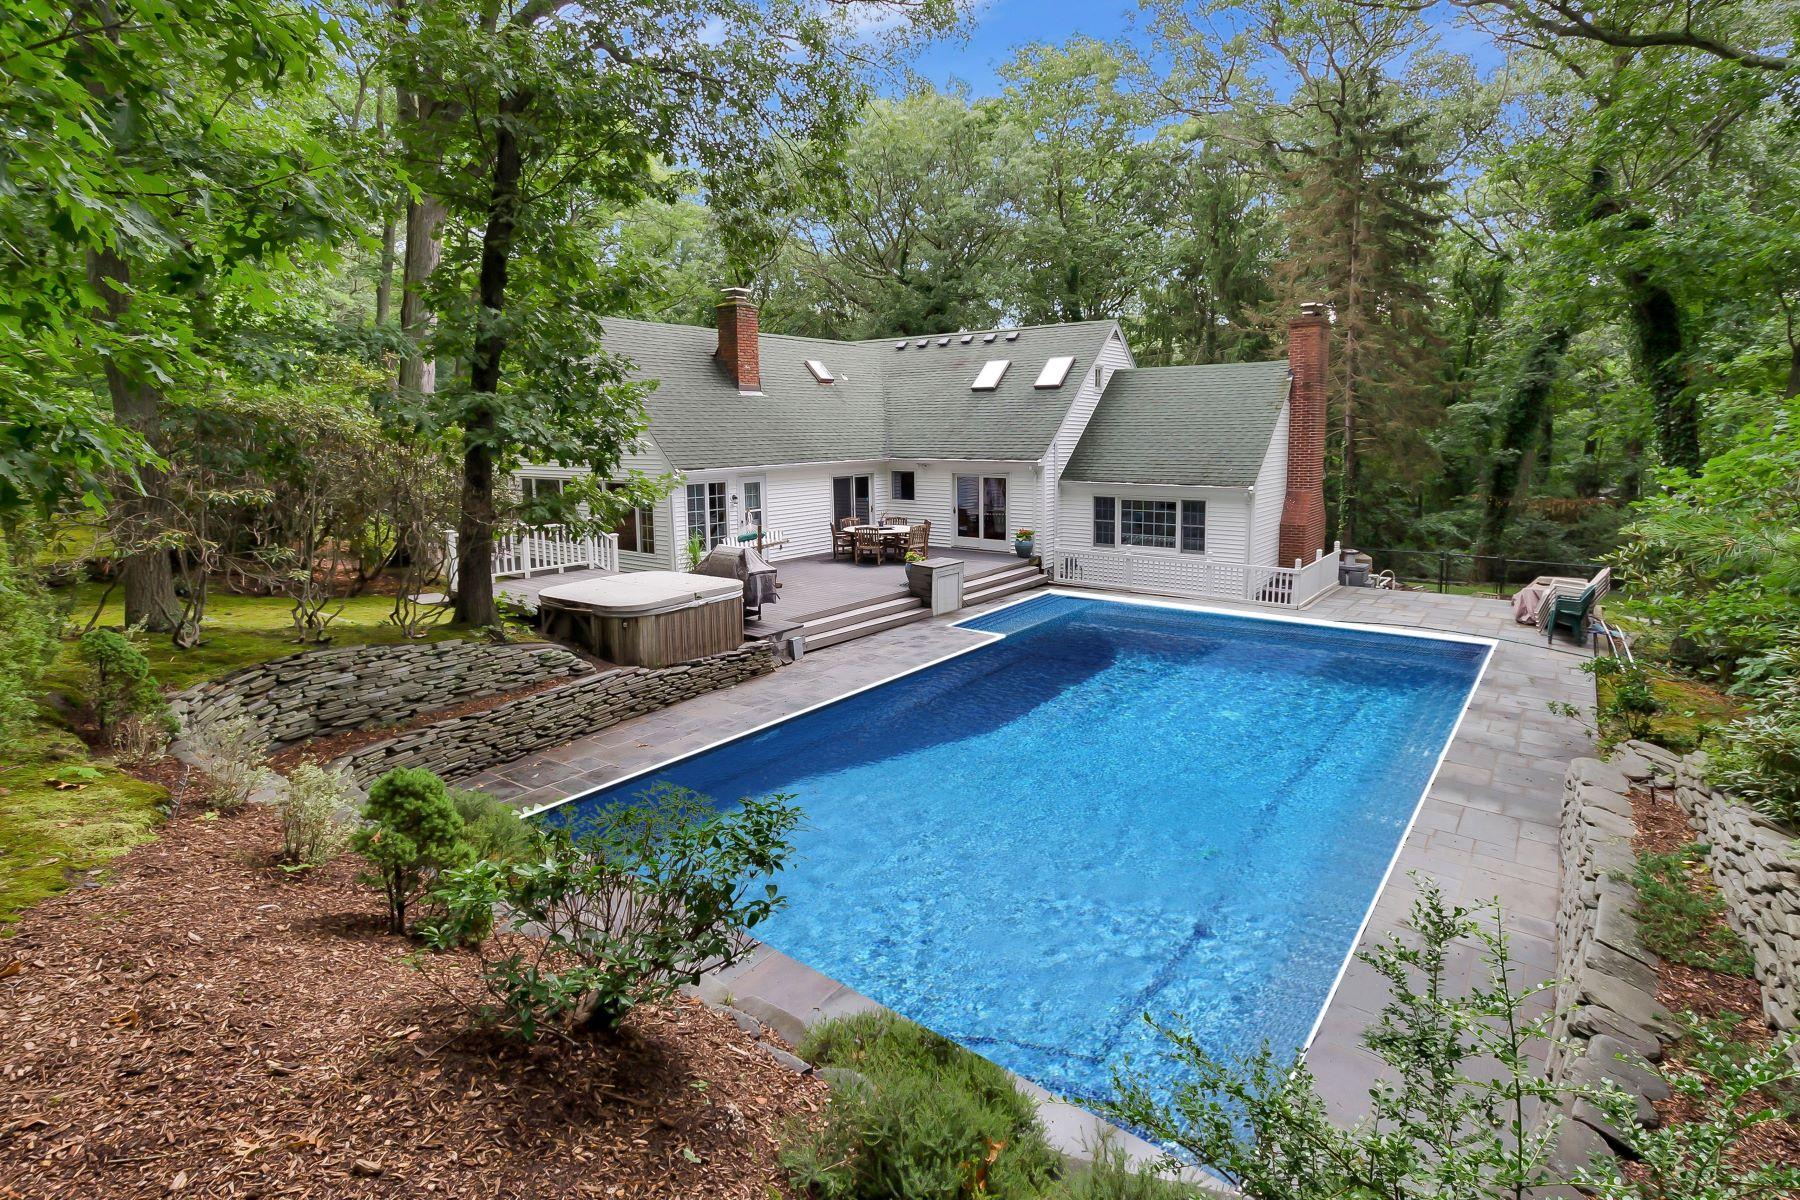 Single Family Homes for Active at Setauket 7 Shortwood Ln Setauket, New York 11733 United States